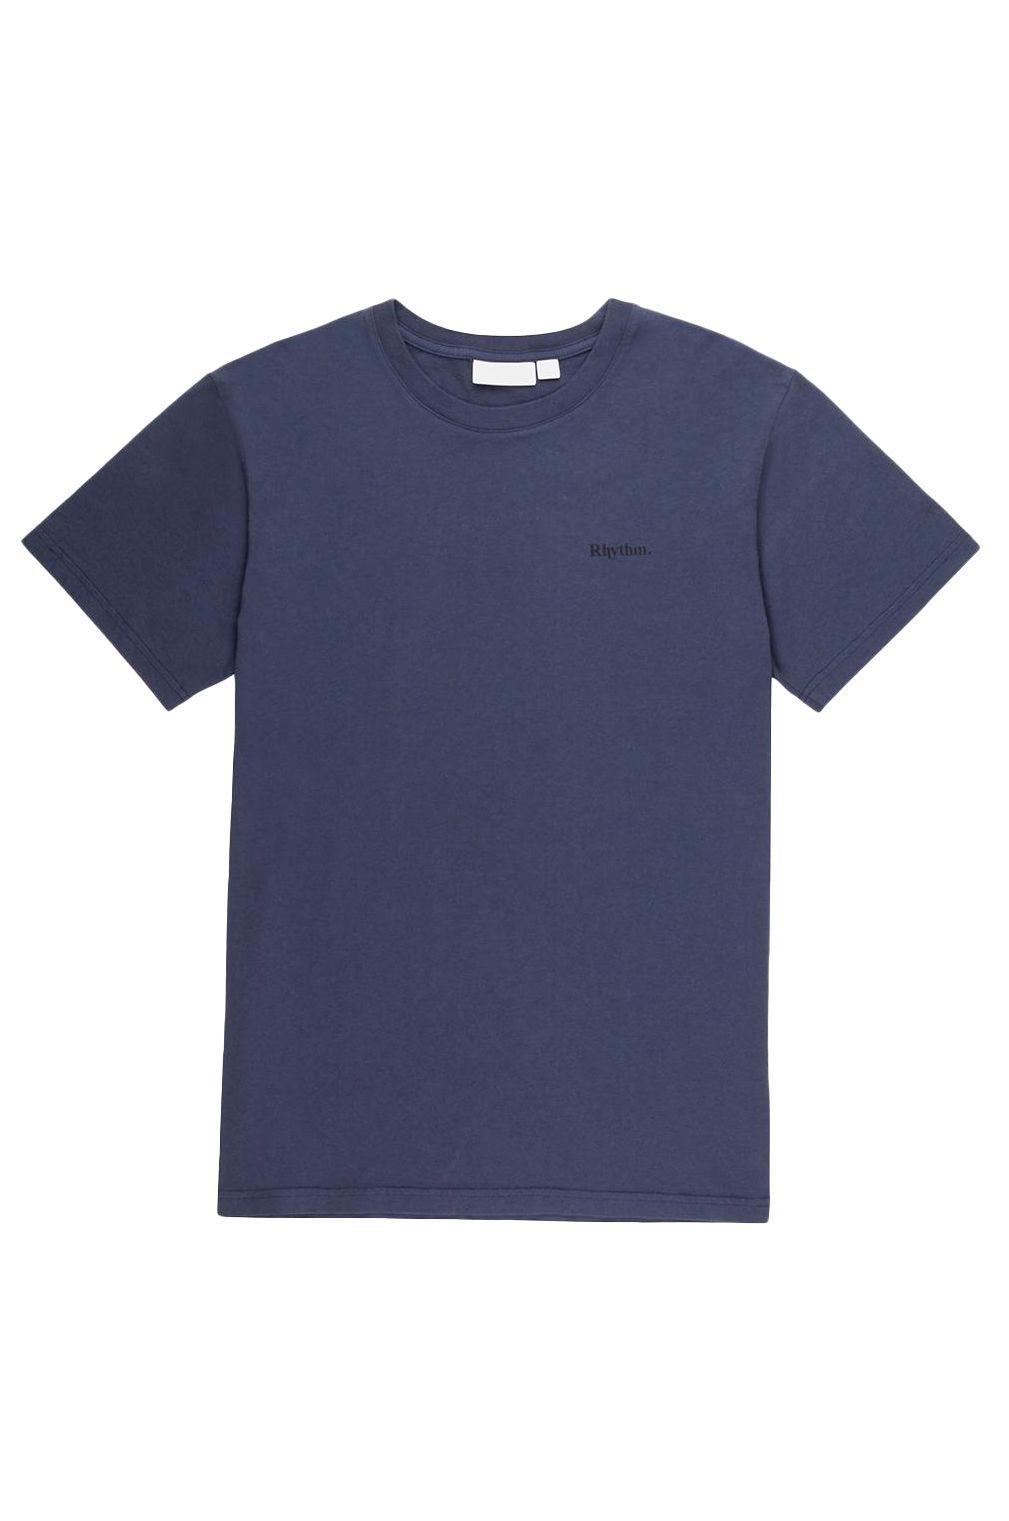 Rhythm T-Shirt ESSENTIAL LOGO T-SHIRT Navy